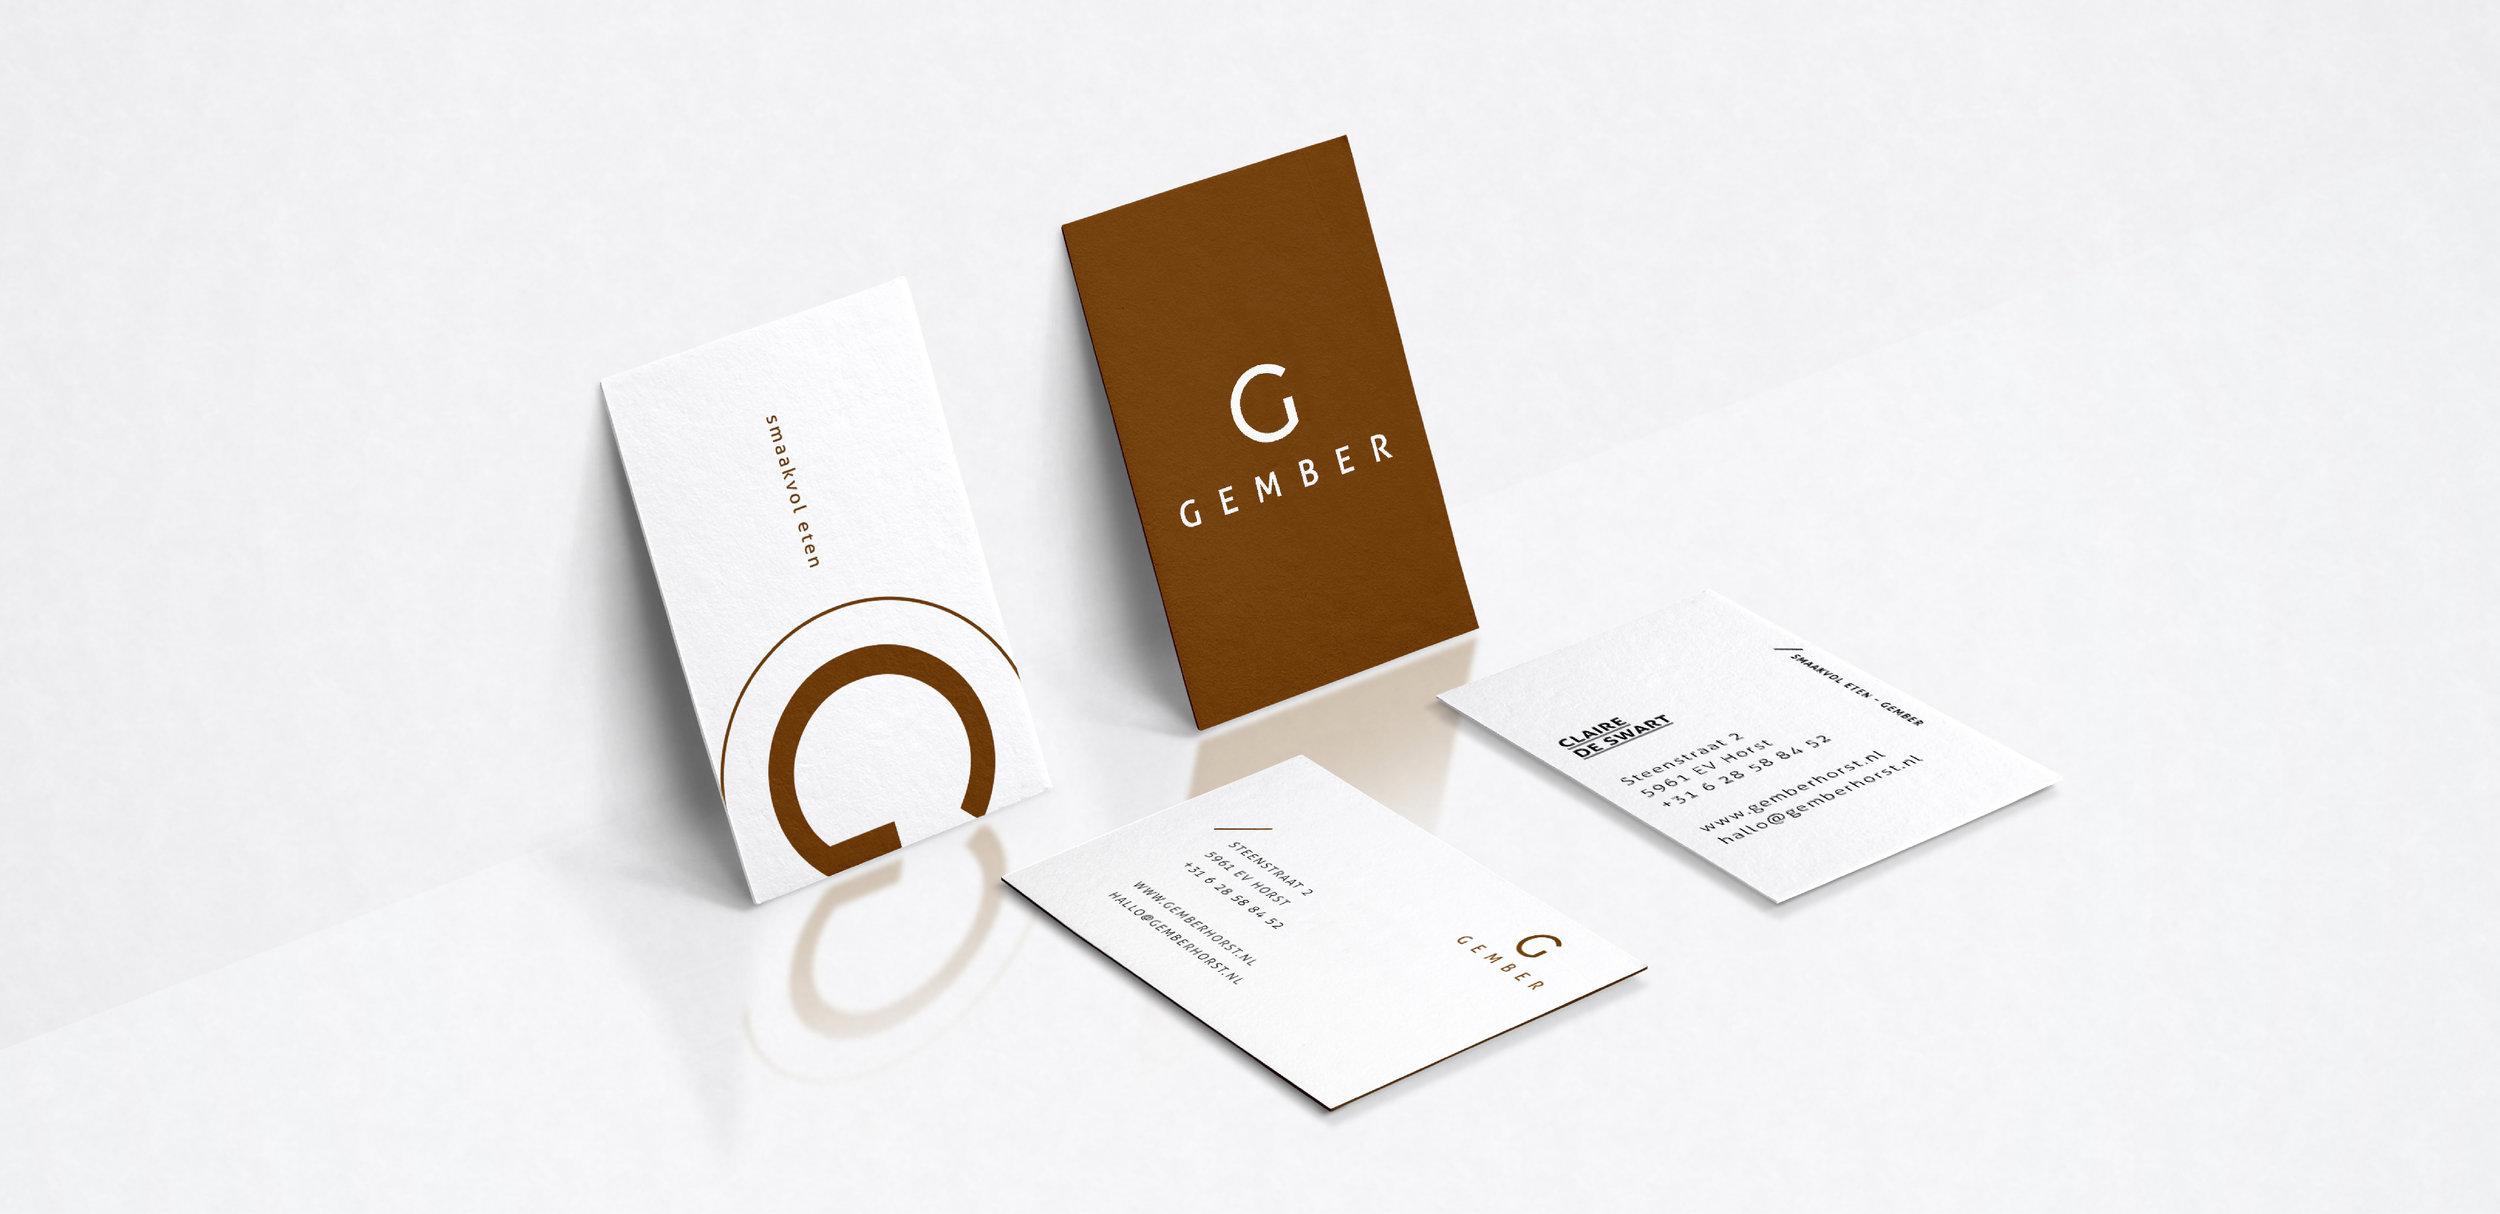 GEMBER  art direction - copywrite - design - fotografie